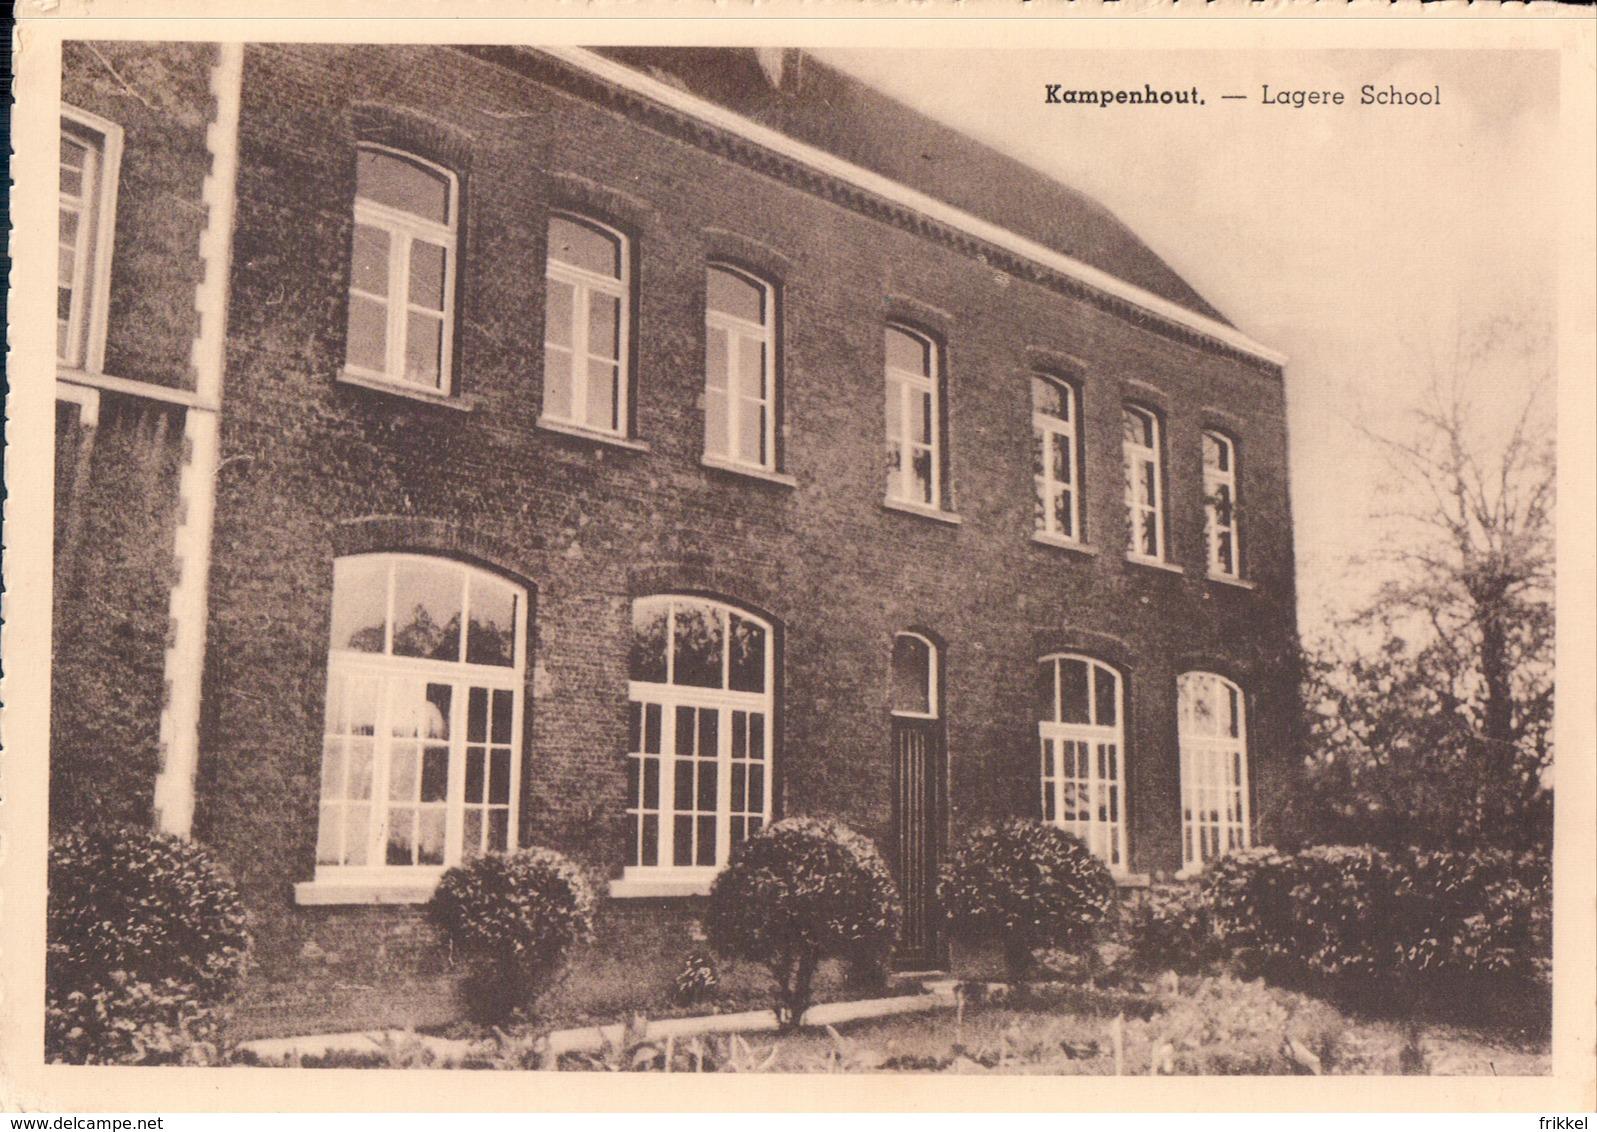 Kampenhout Lagere School - Kampenhout